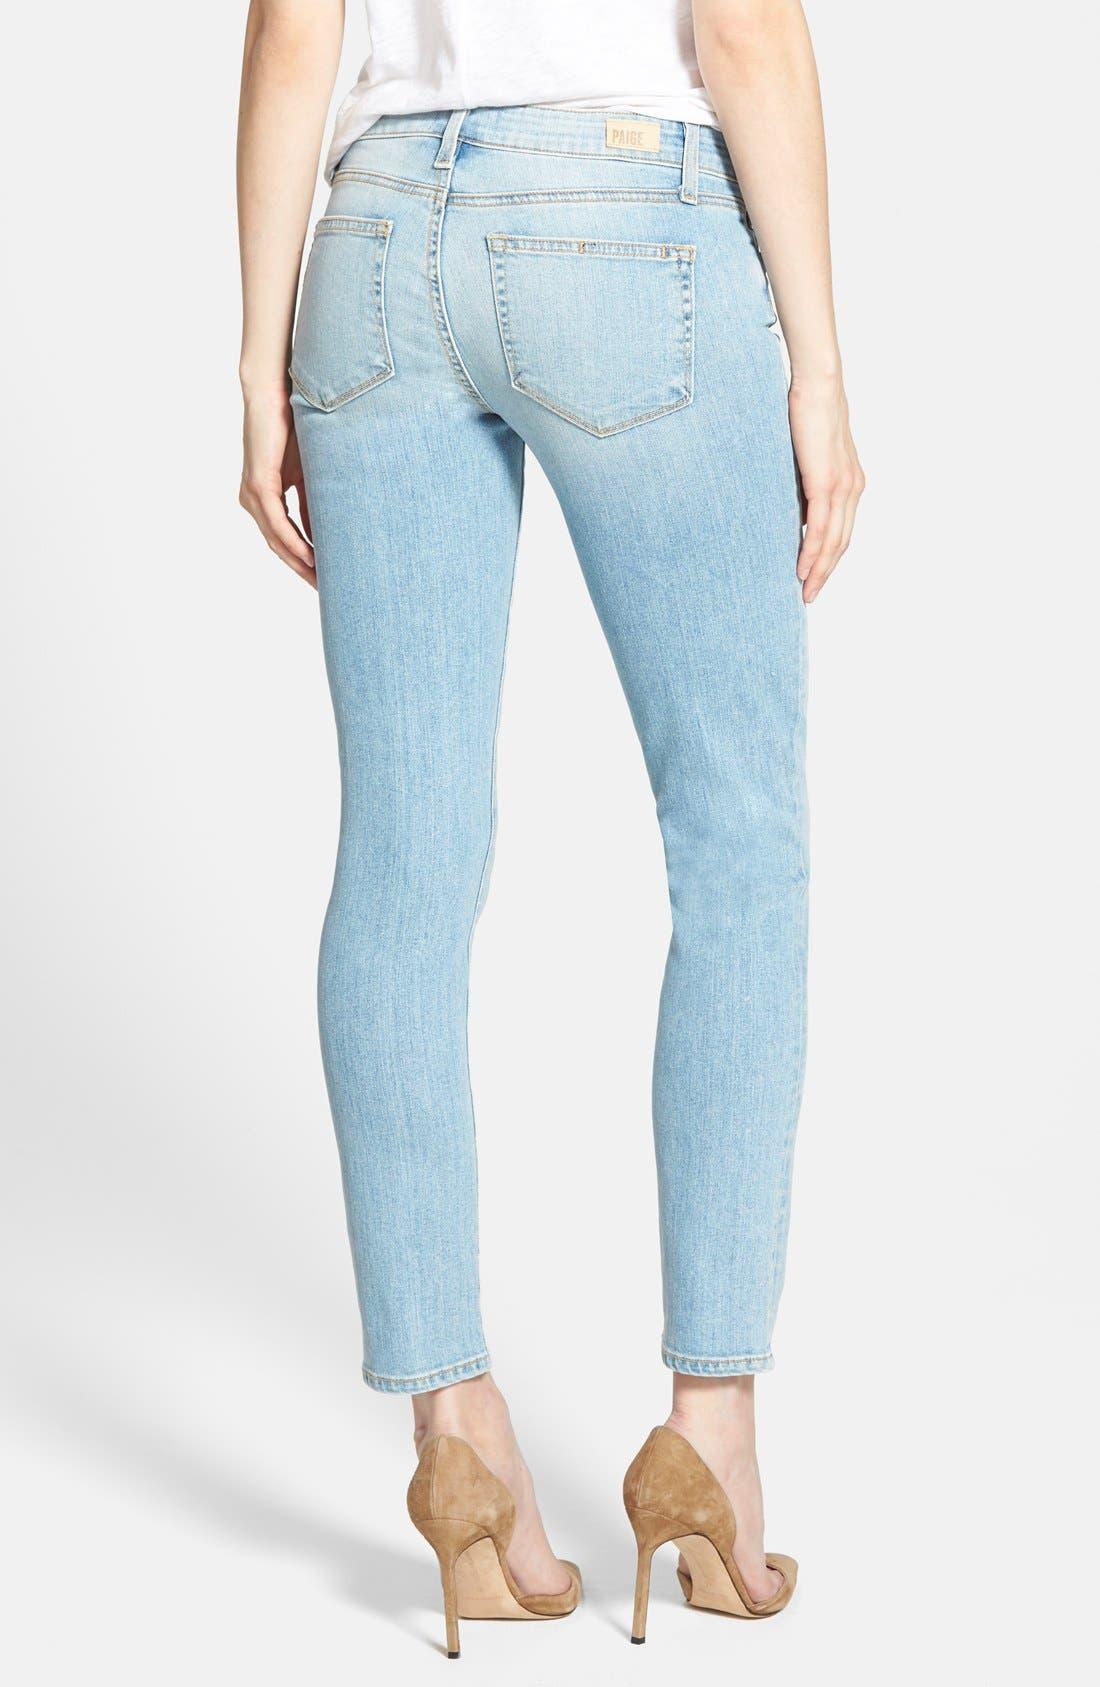 Alternate Image 2  - Paige Denim 'Skyline' Ankle Peg Jeans (Loren Blue)